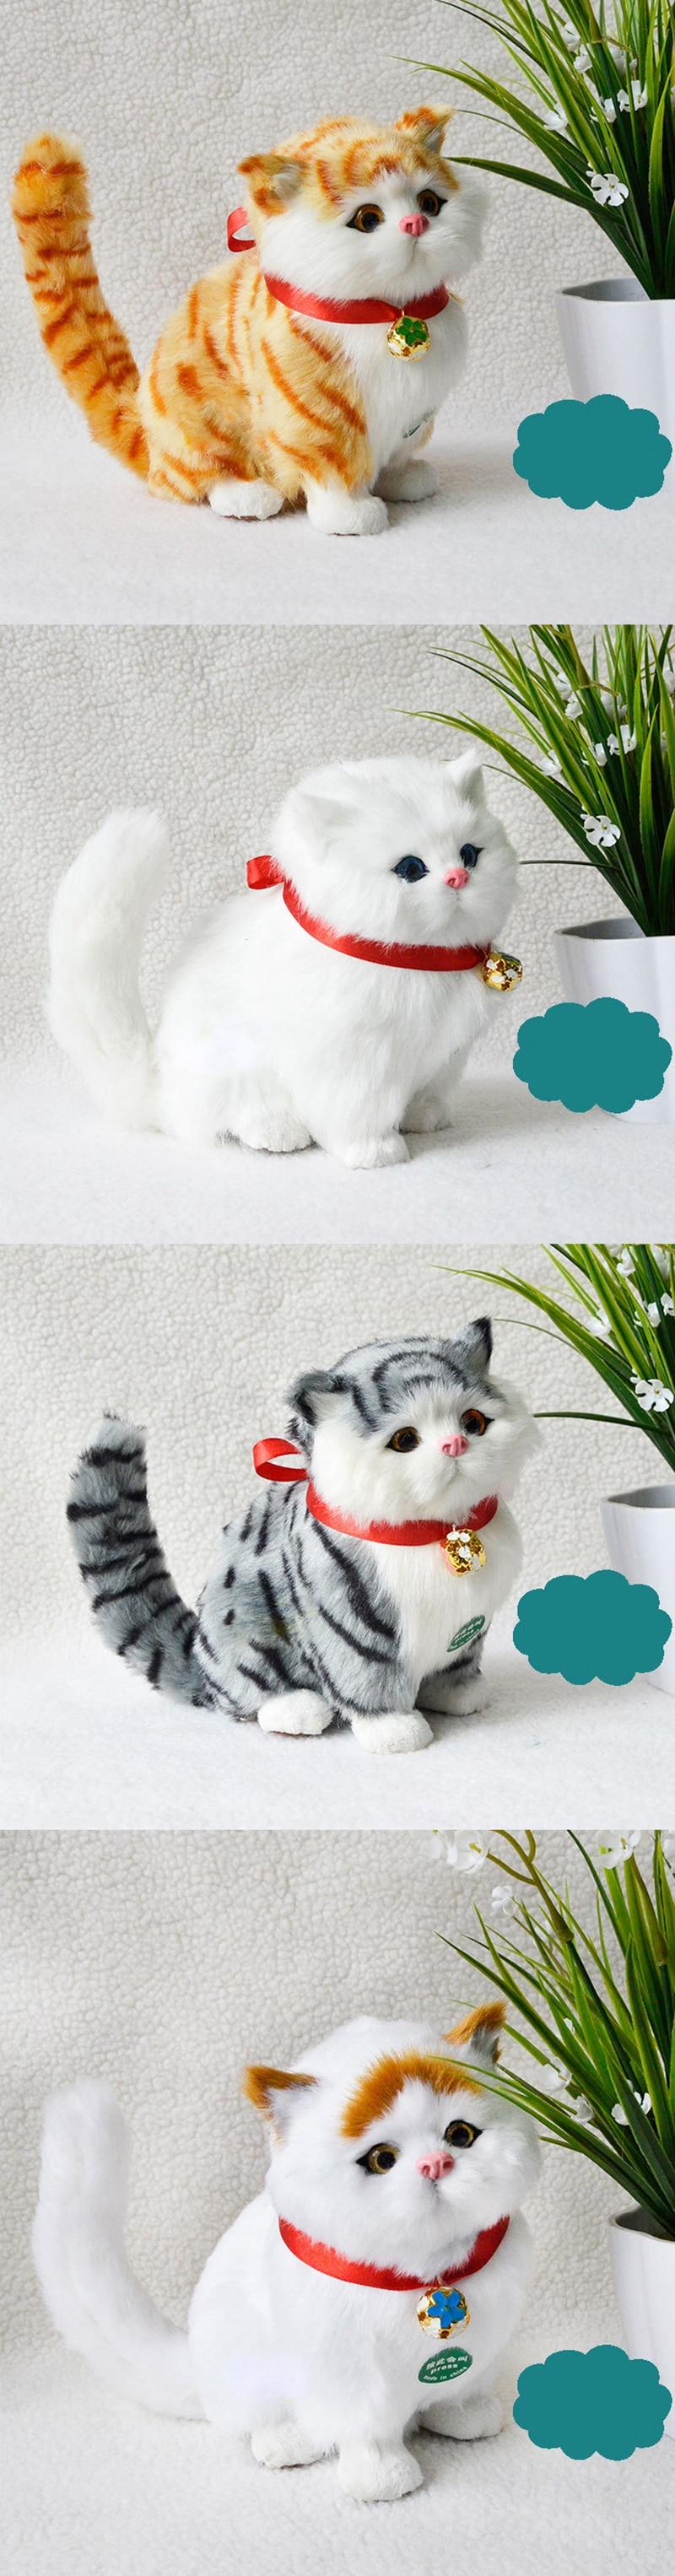 plush cat toy (8)